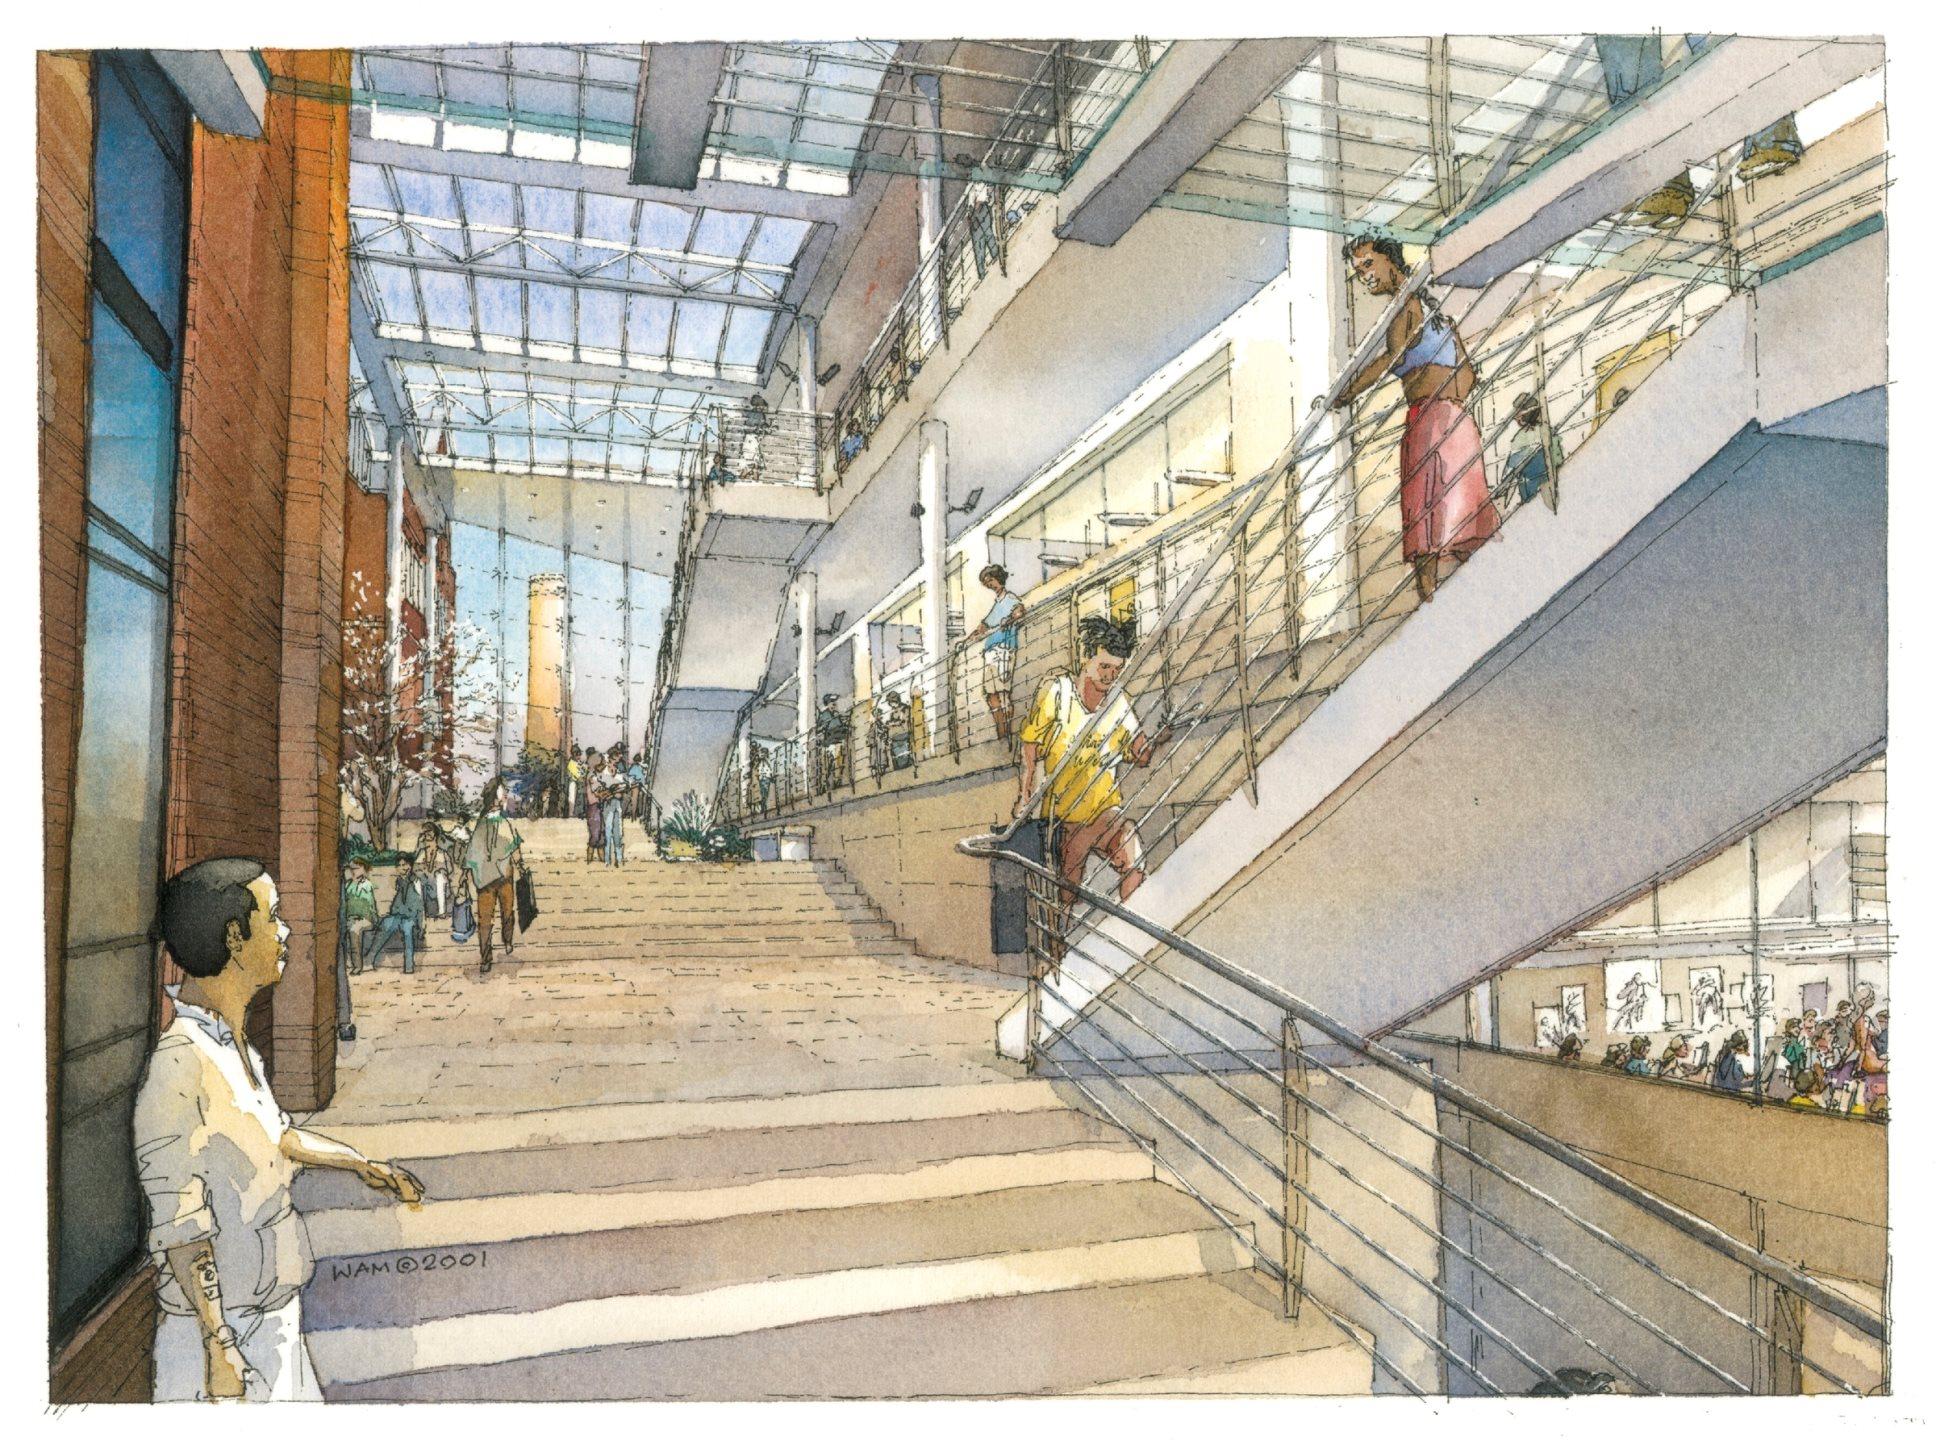 Kansas City Art Institute Campus Master Plan | BNIM